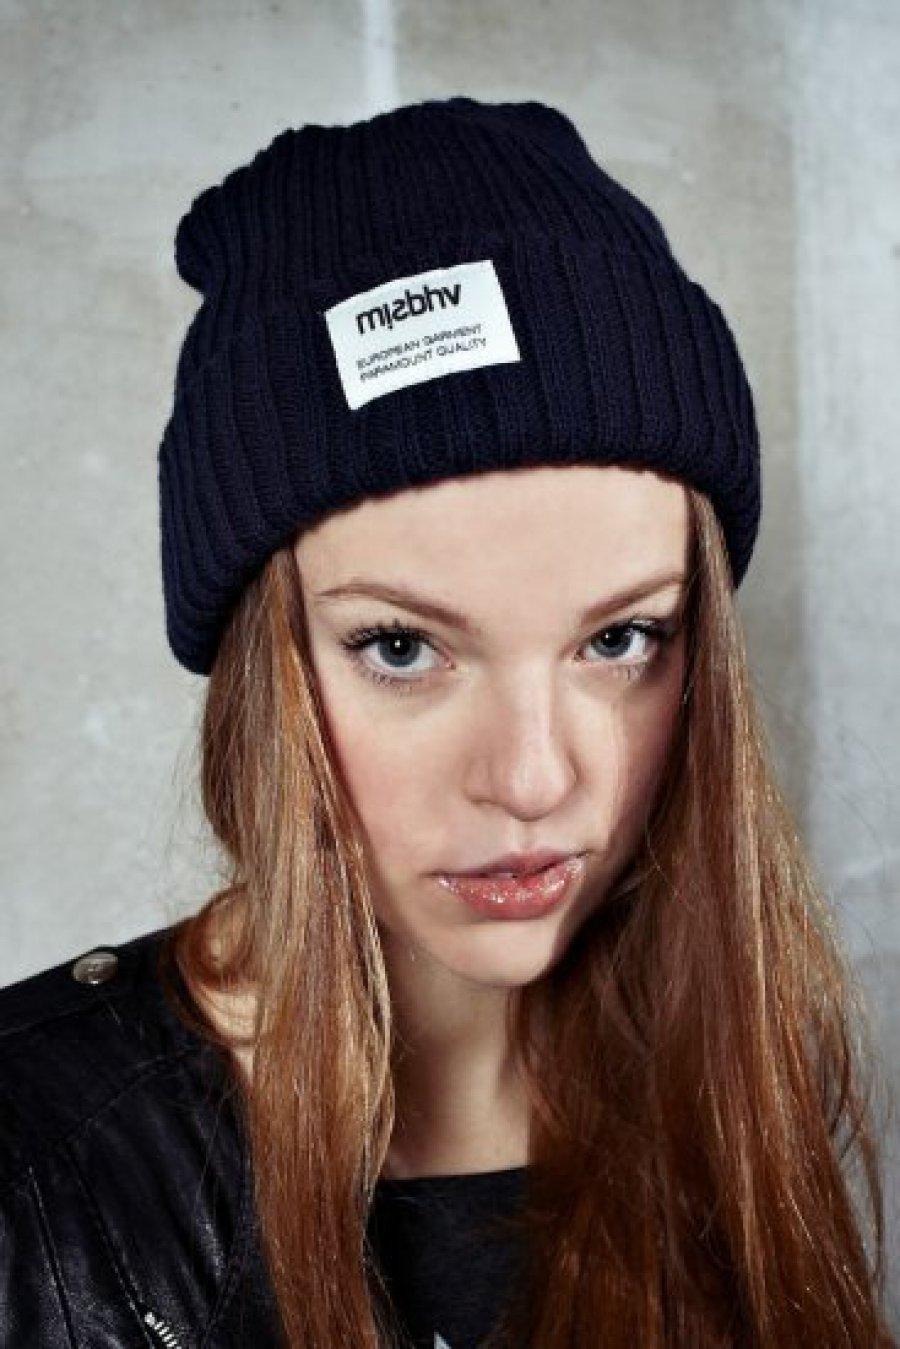 CHRZANÓW. Polska ogląda młodą modelkę